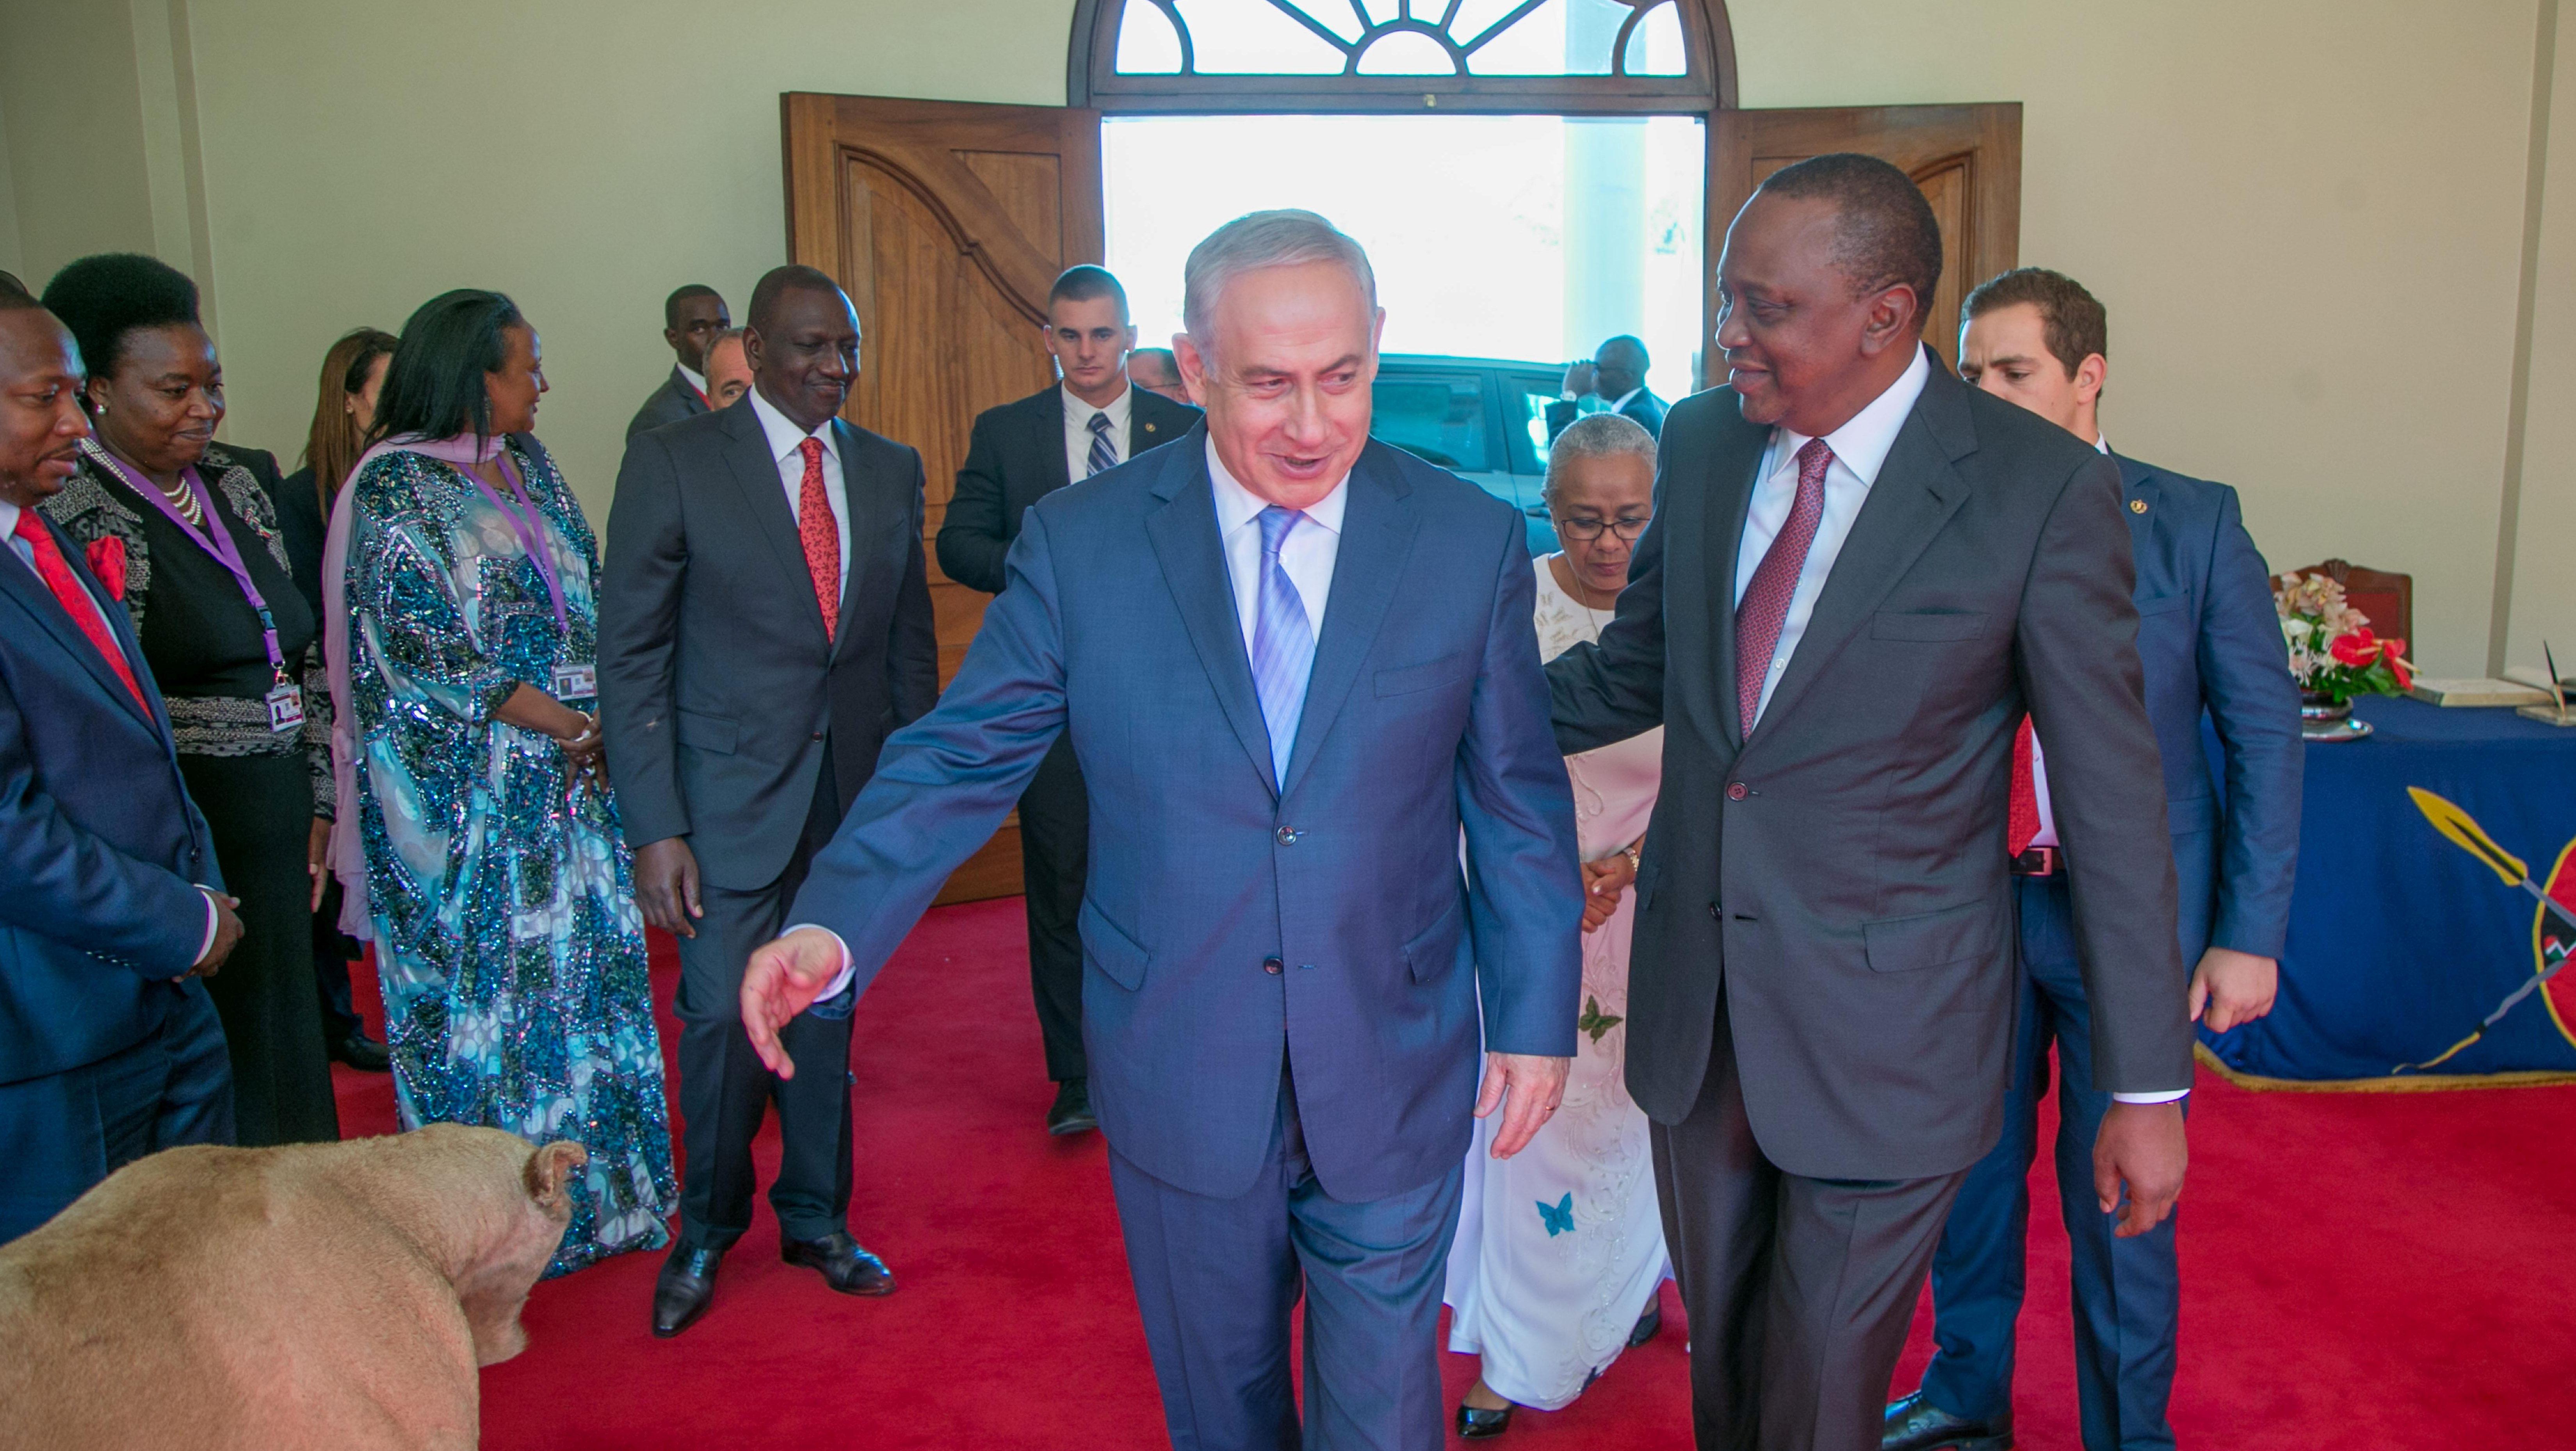 Israeli Prime Minister Benjamin Netanyahu meets Kenya's President Uhuru Kenyatta at State House in Nairobi, Kenya November 28, 2017.